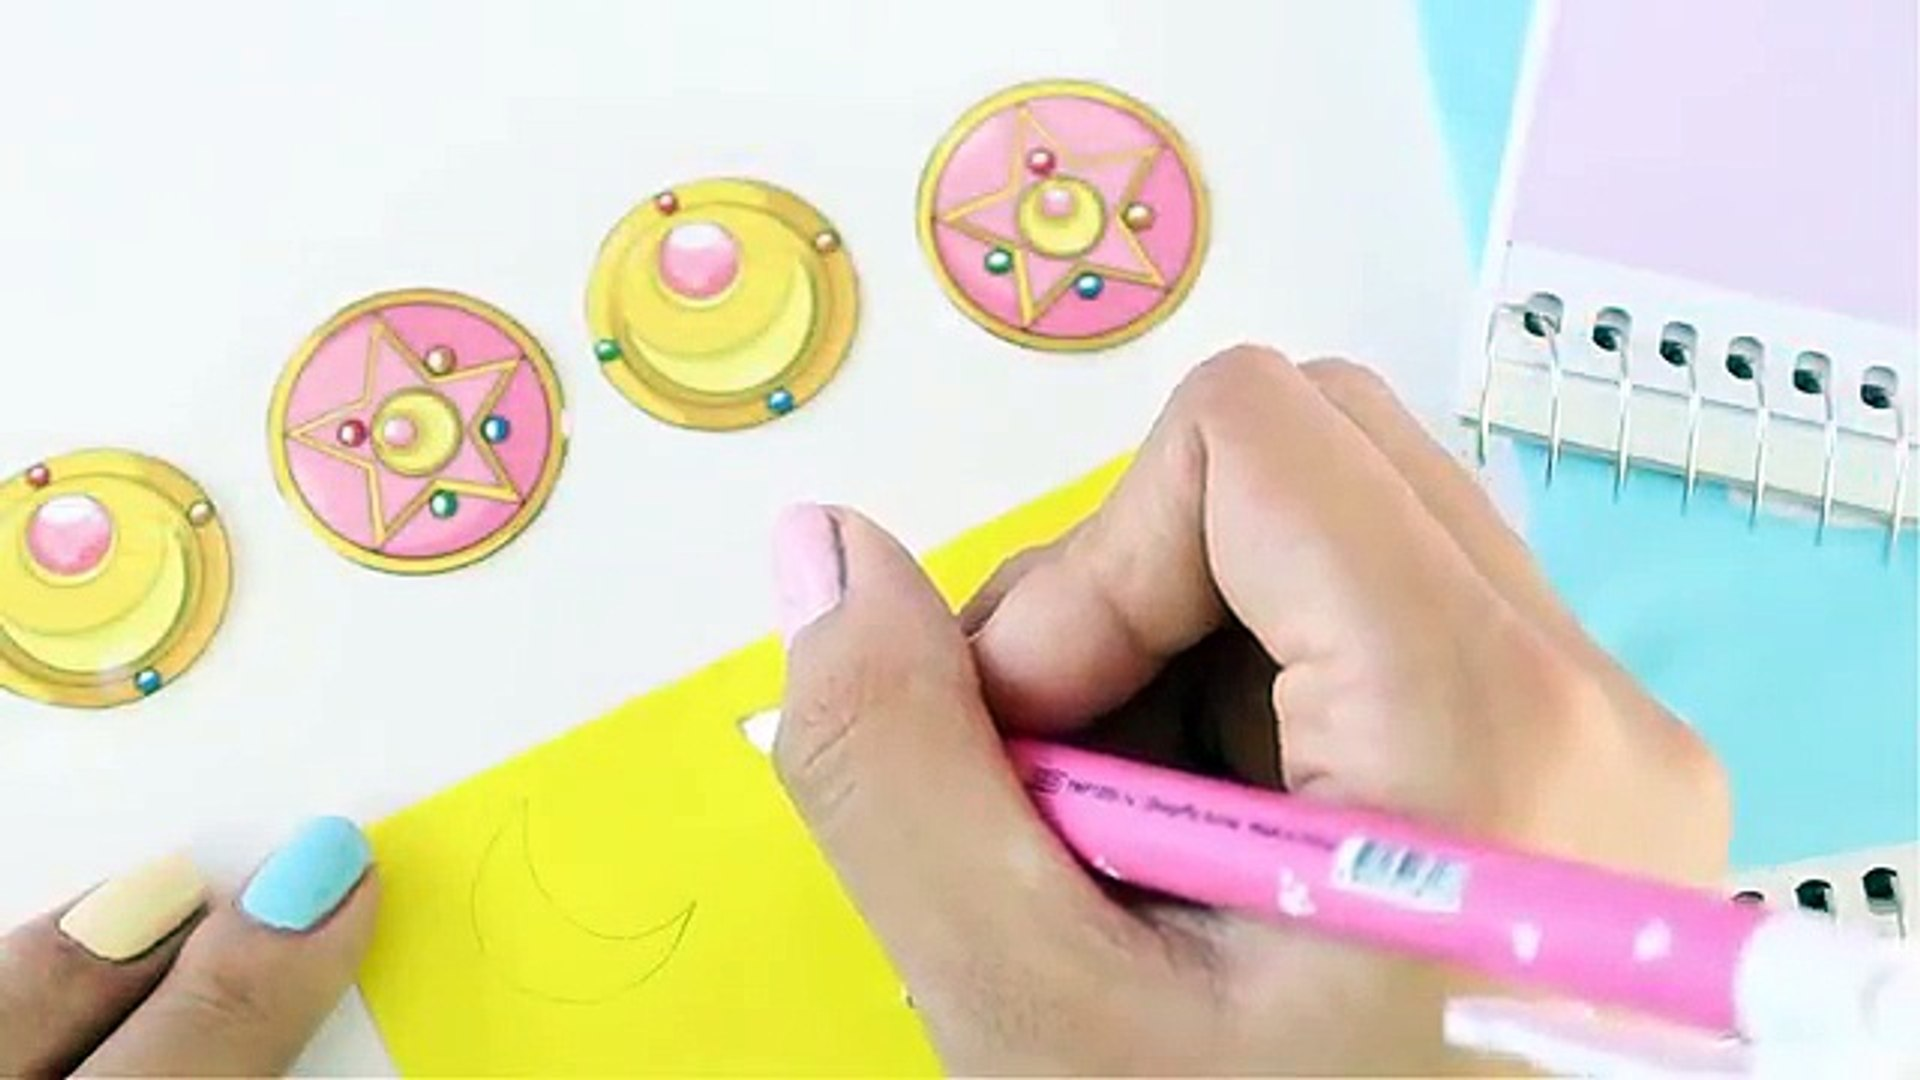 Decorar Cuadernos Sailor Moon Kawaii Regreso A Clases Video Dailymotion